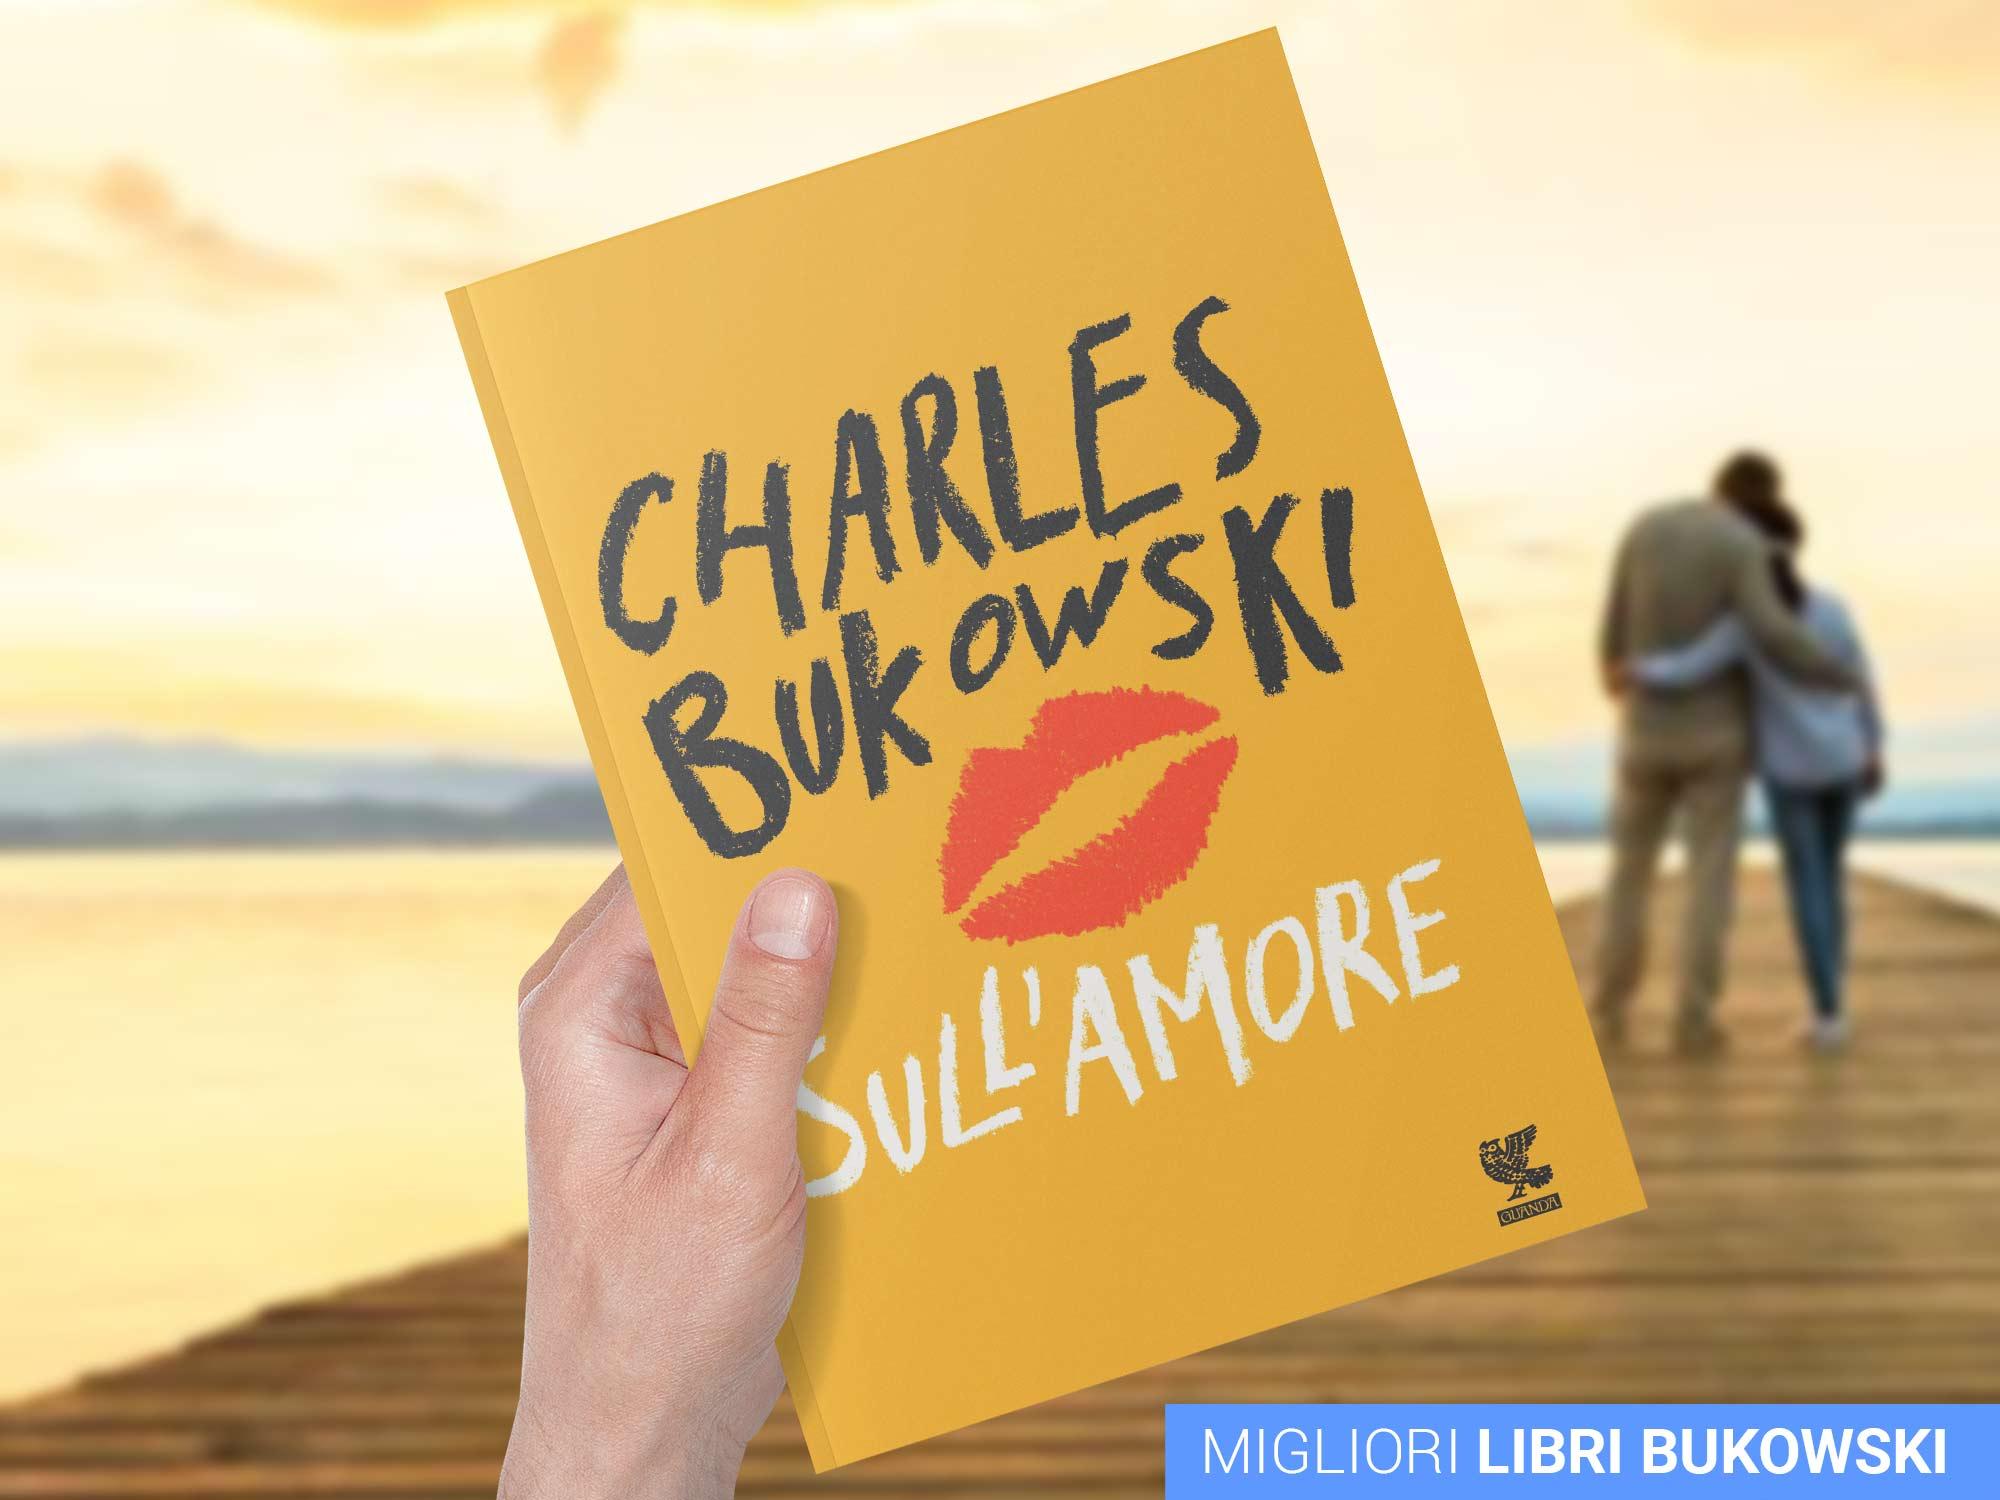 storie-bukowski-sull'amore-libro